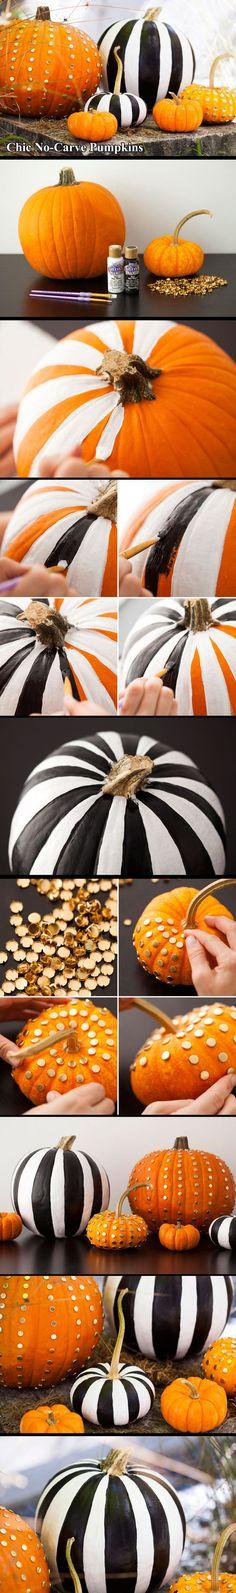 2 Ways to Make Chic No-Carve Pumpkins Pinterest Tim burton - tim burton halloween decorations